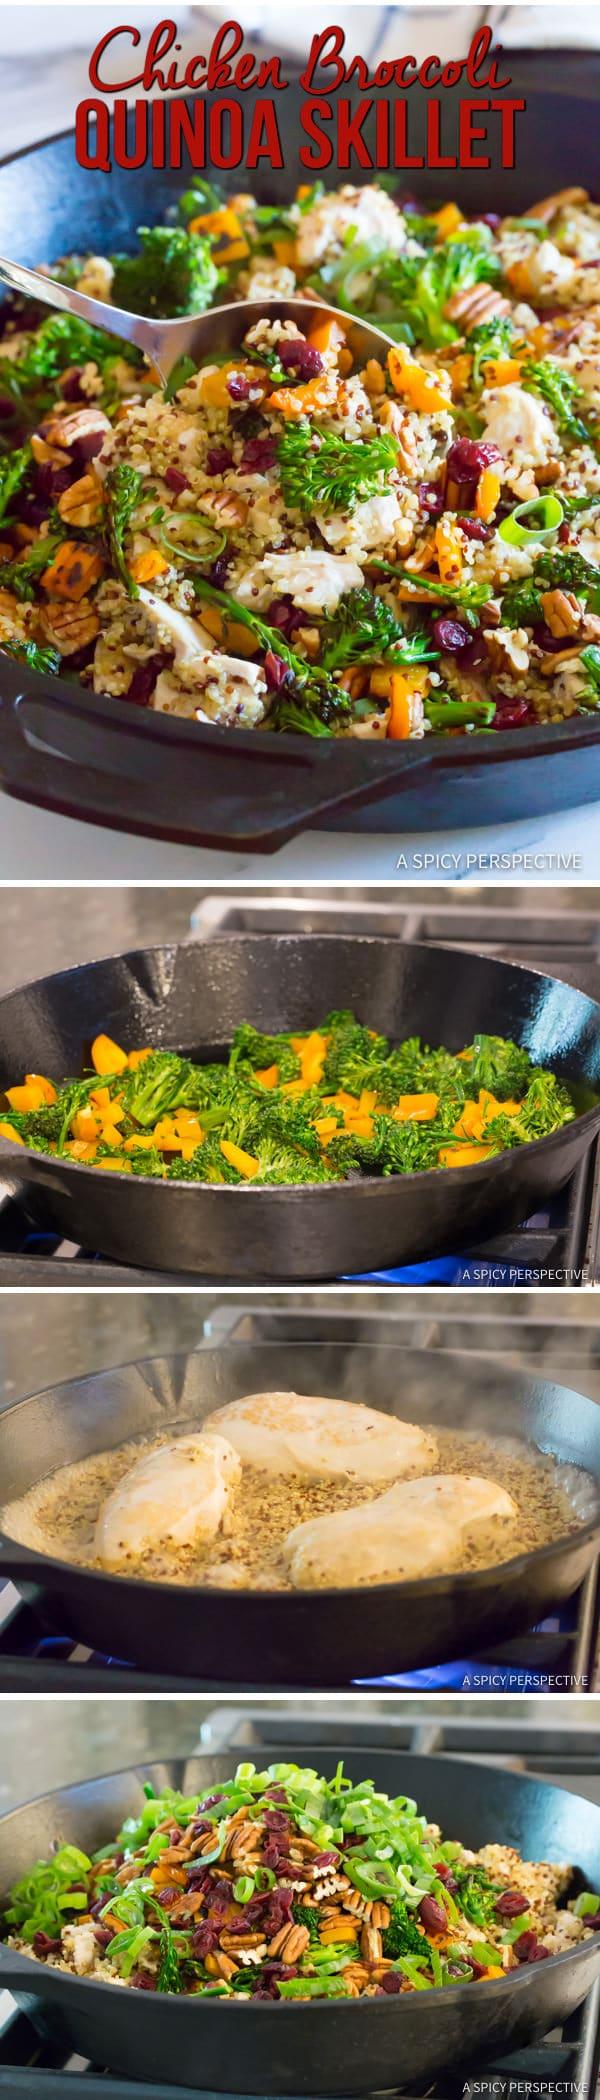 Healthy One-Pot Chicken Broccoli Quinoa Skillet Recipe   ASpicyPerspective.com